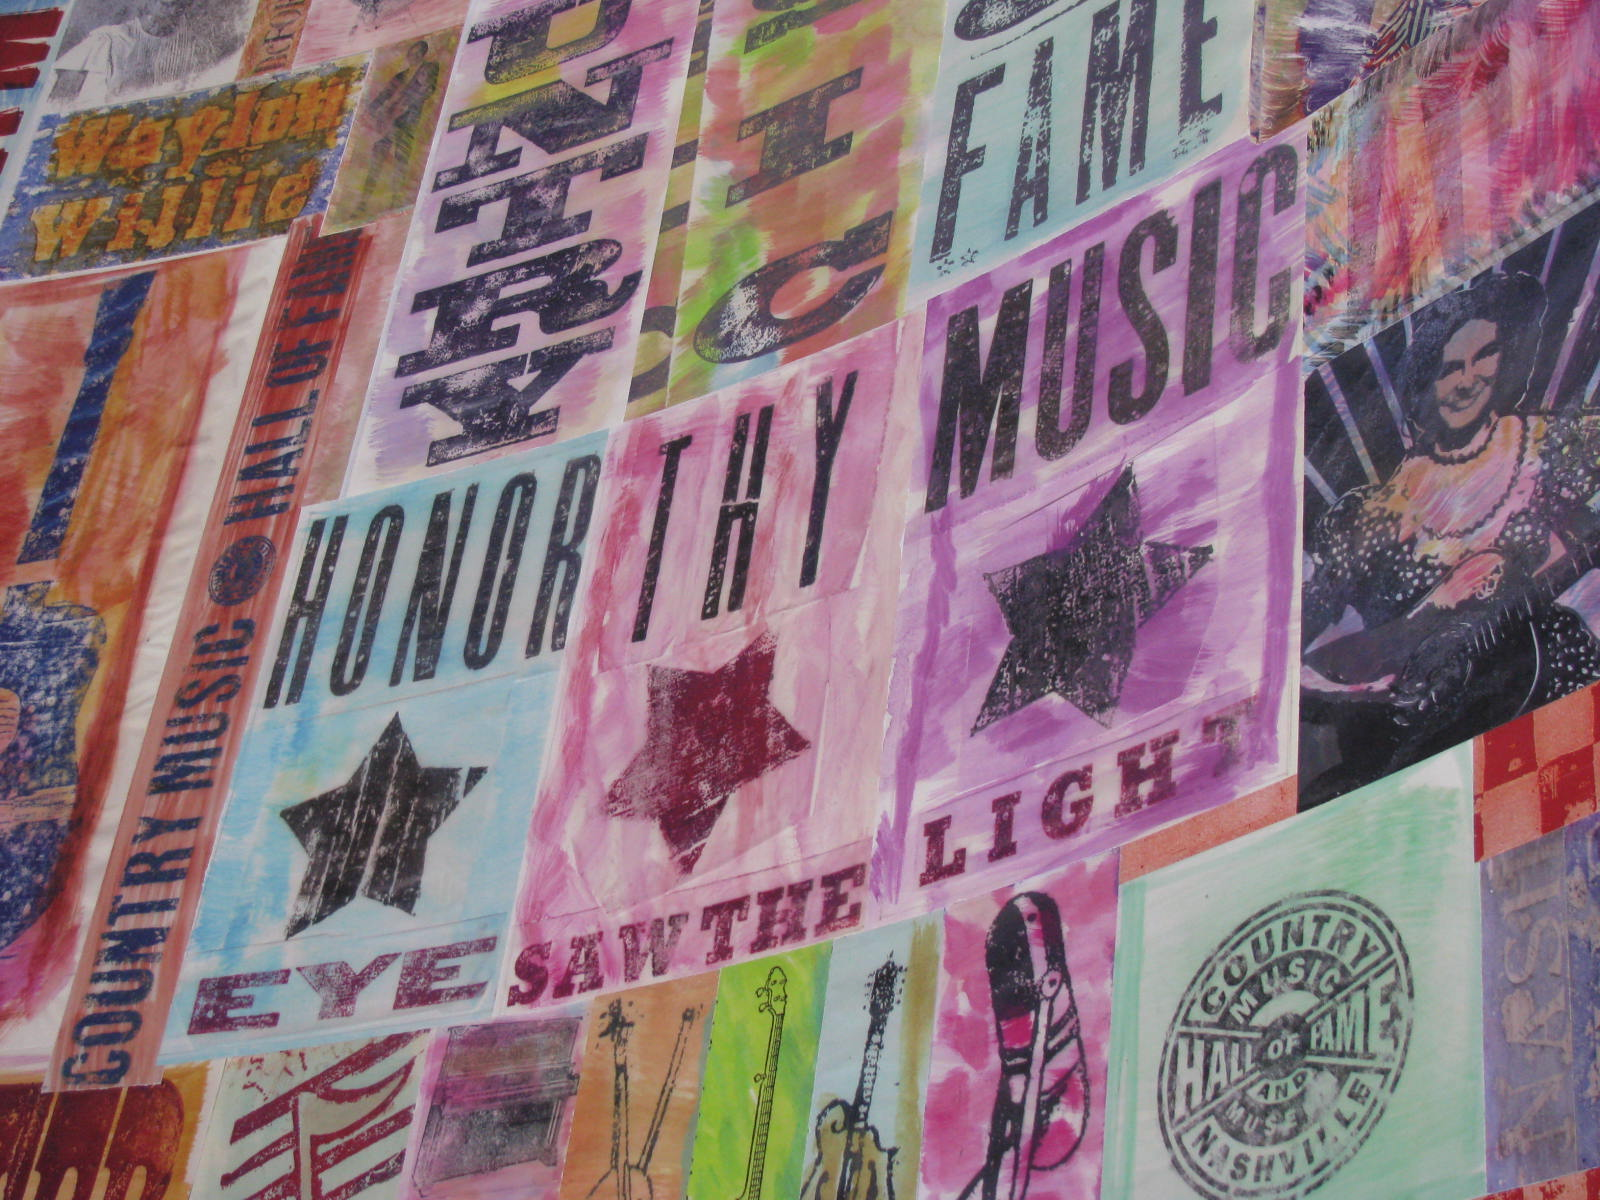 MIXTAPE: Lee Ann Womack's Country Primer